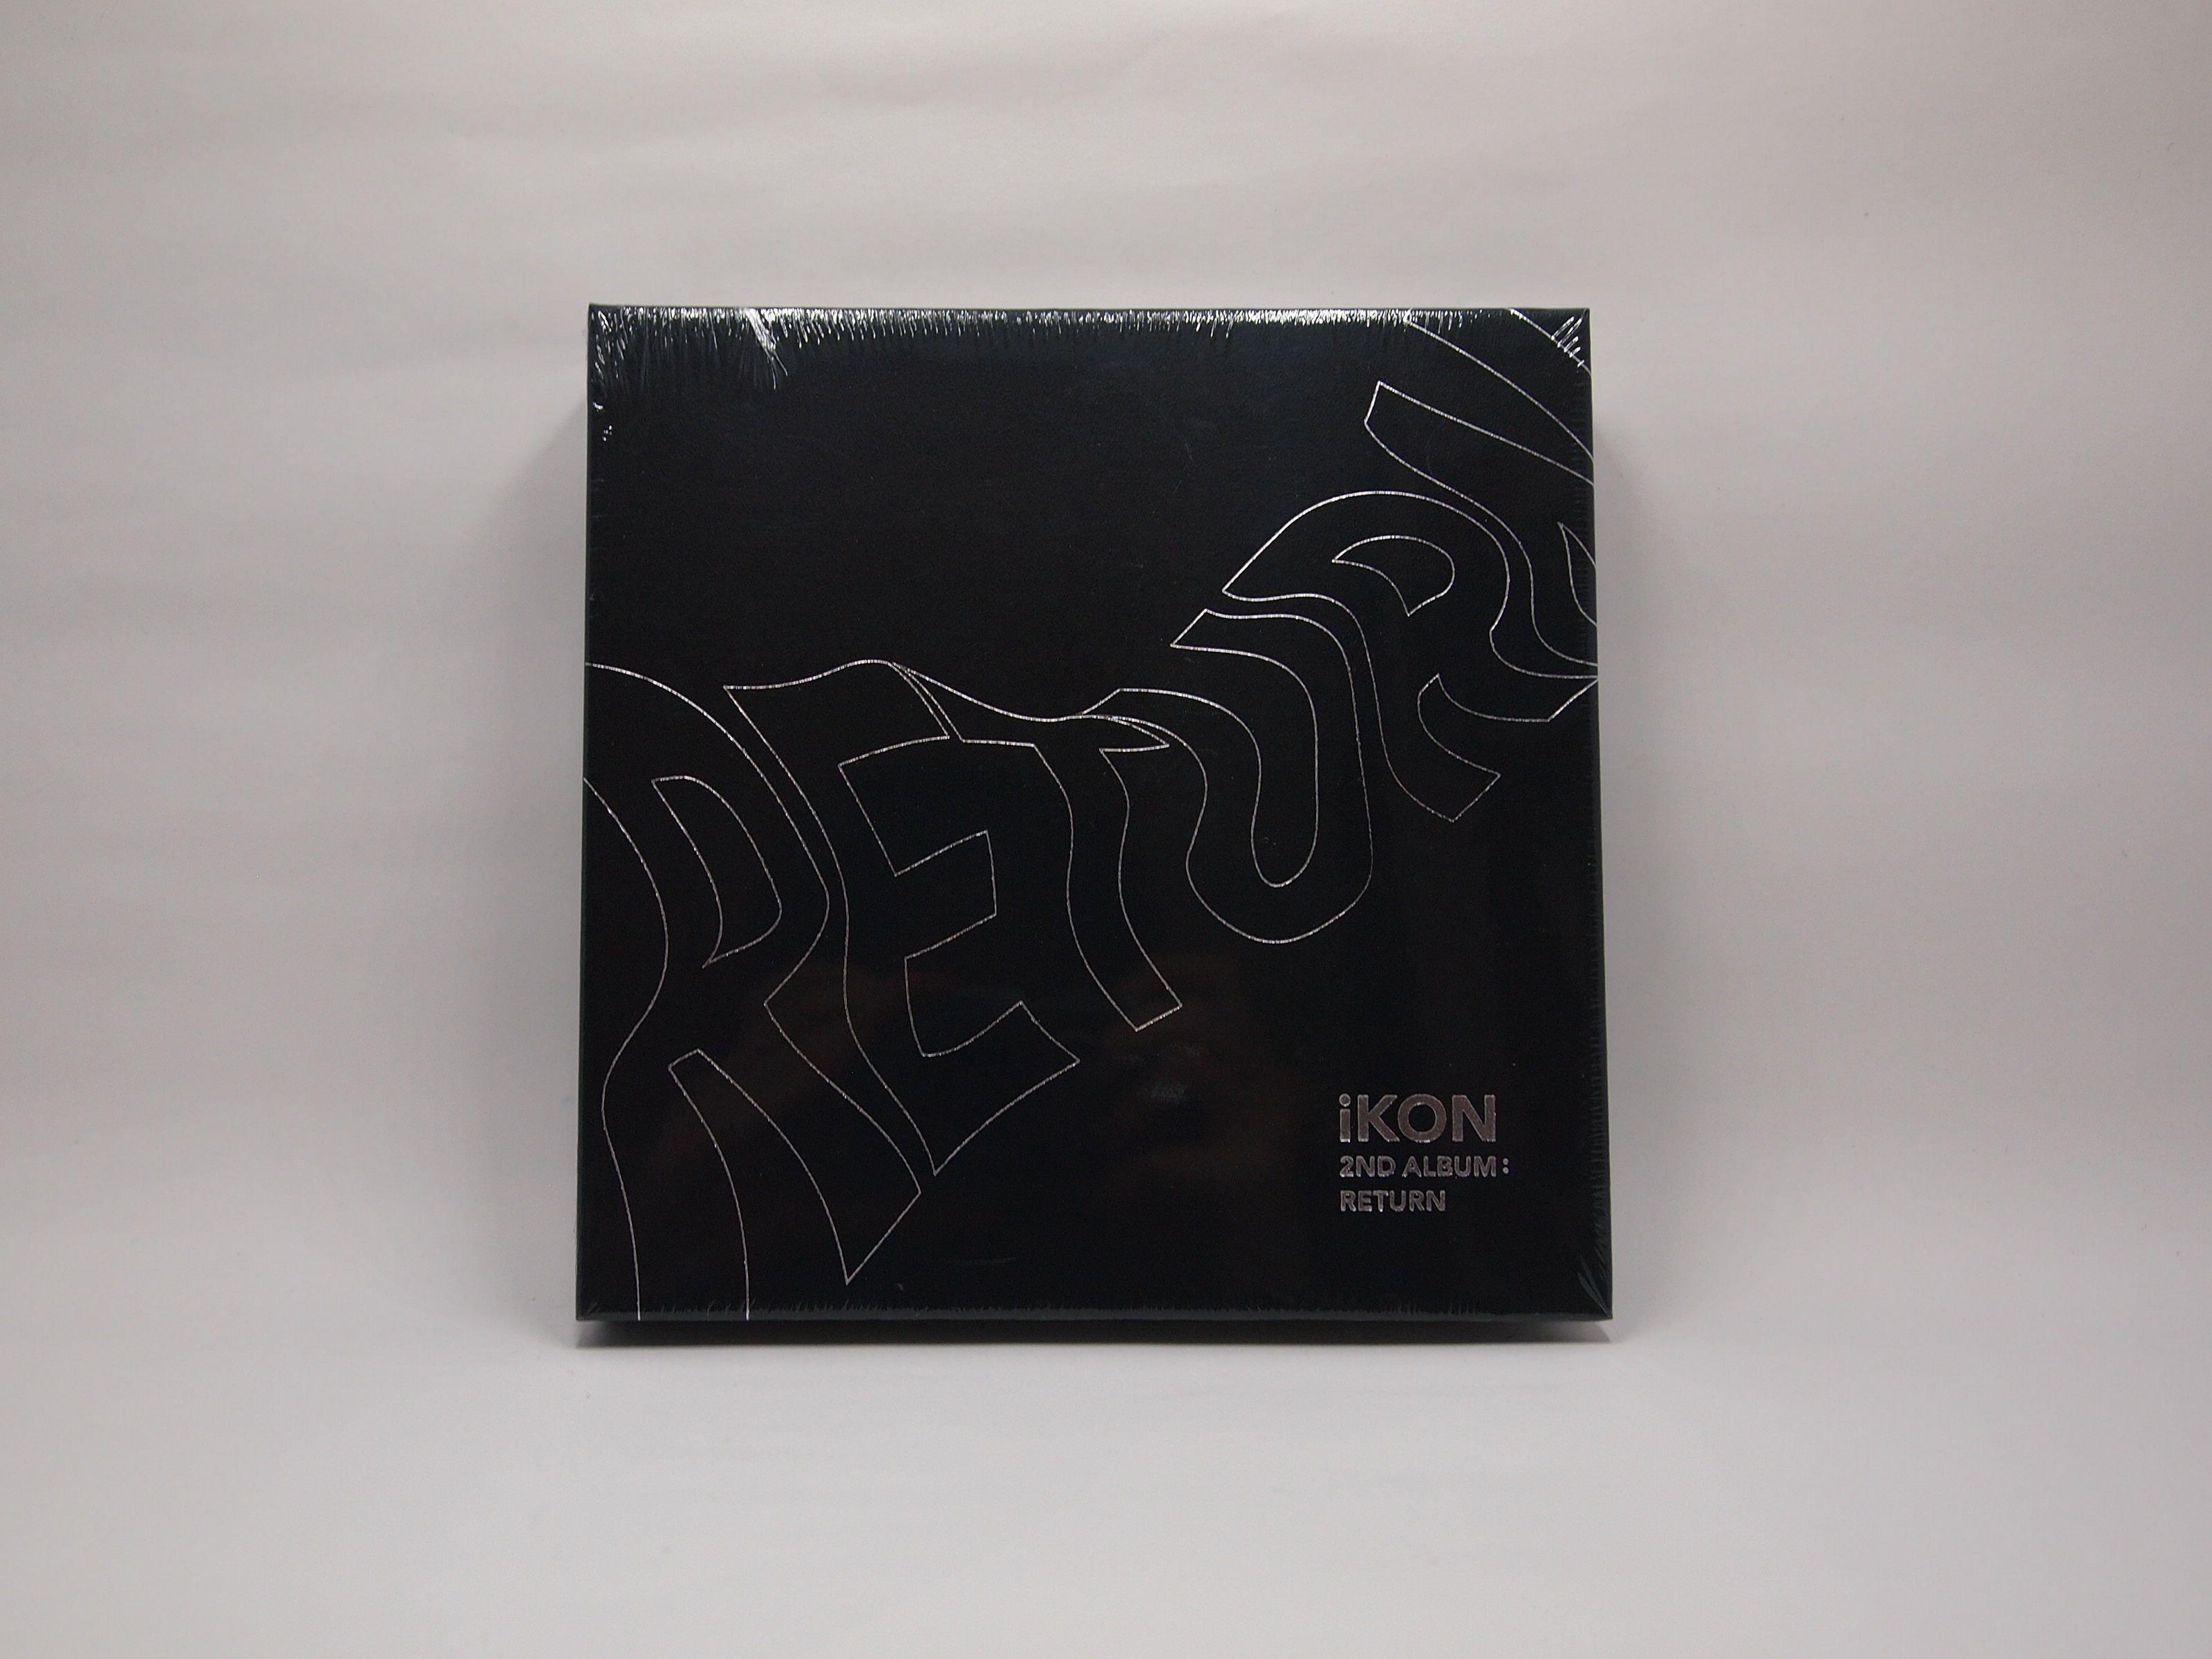 iKON - 2nd Album Return (Black )